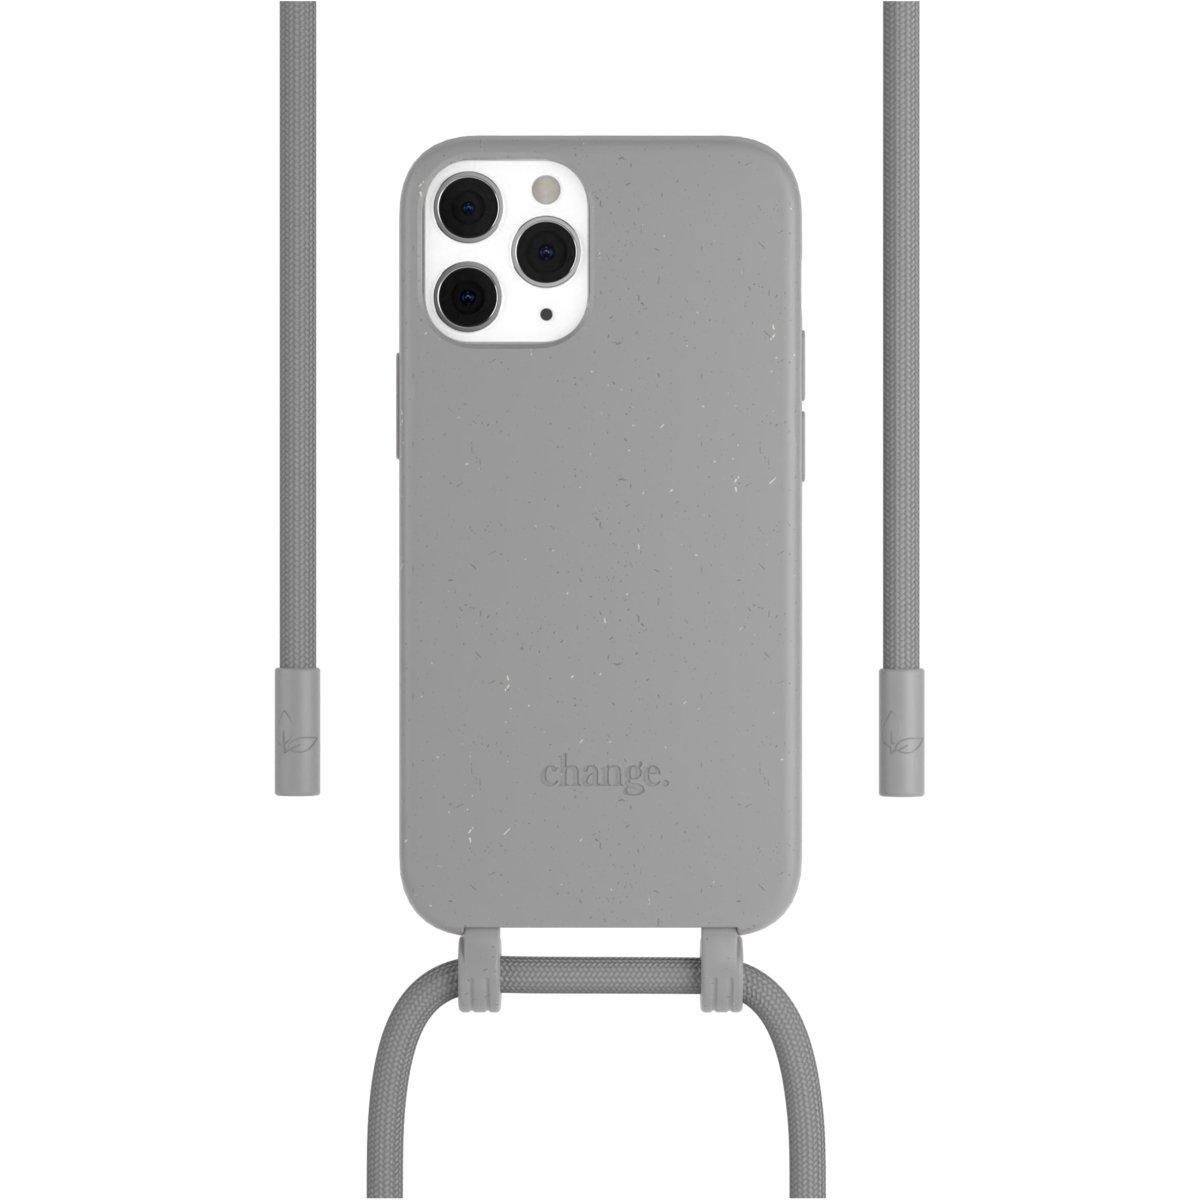 Woodcessories Change Case AM iPhone 12 / 12 Pro - grey